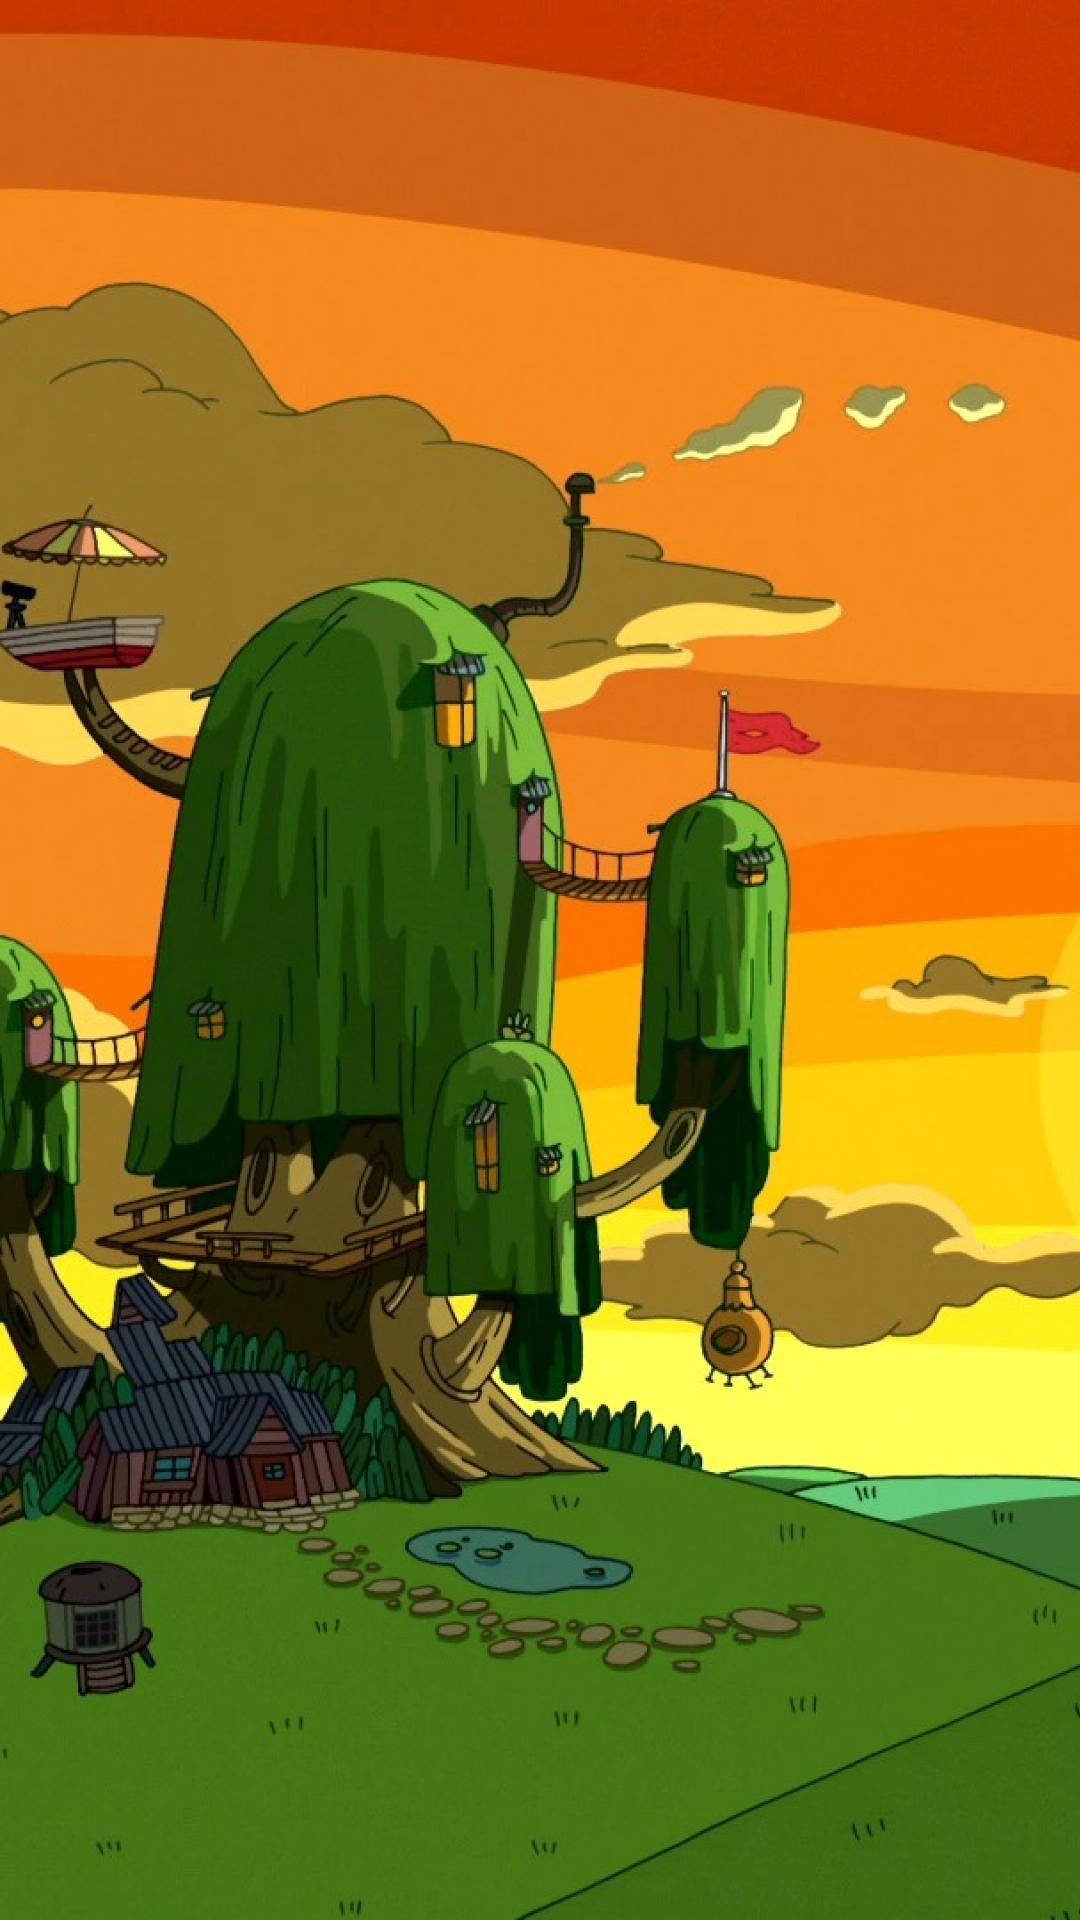 Aesthetic Adventure Time Picture Adventure Time Wallpaper Adventure Time Background Adventure Time Iphone Wallpaper